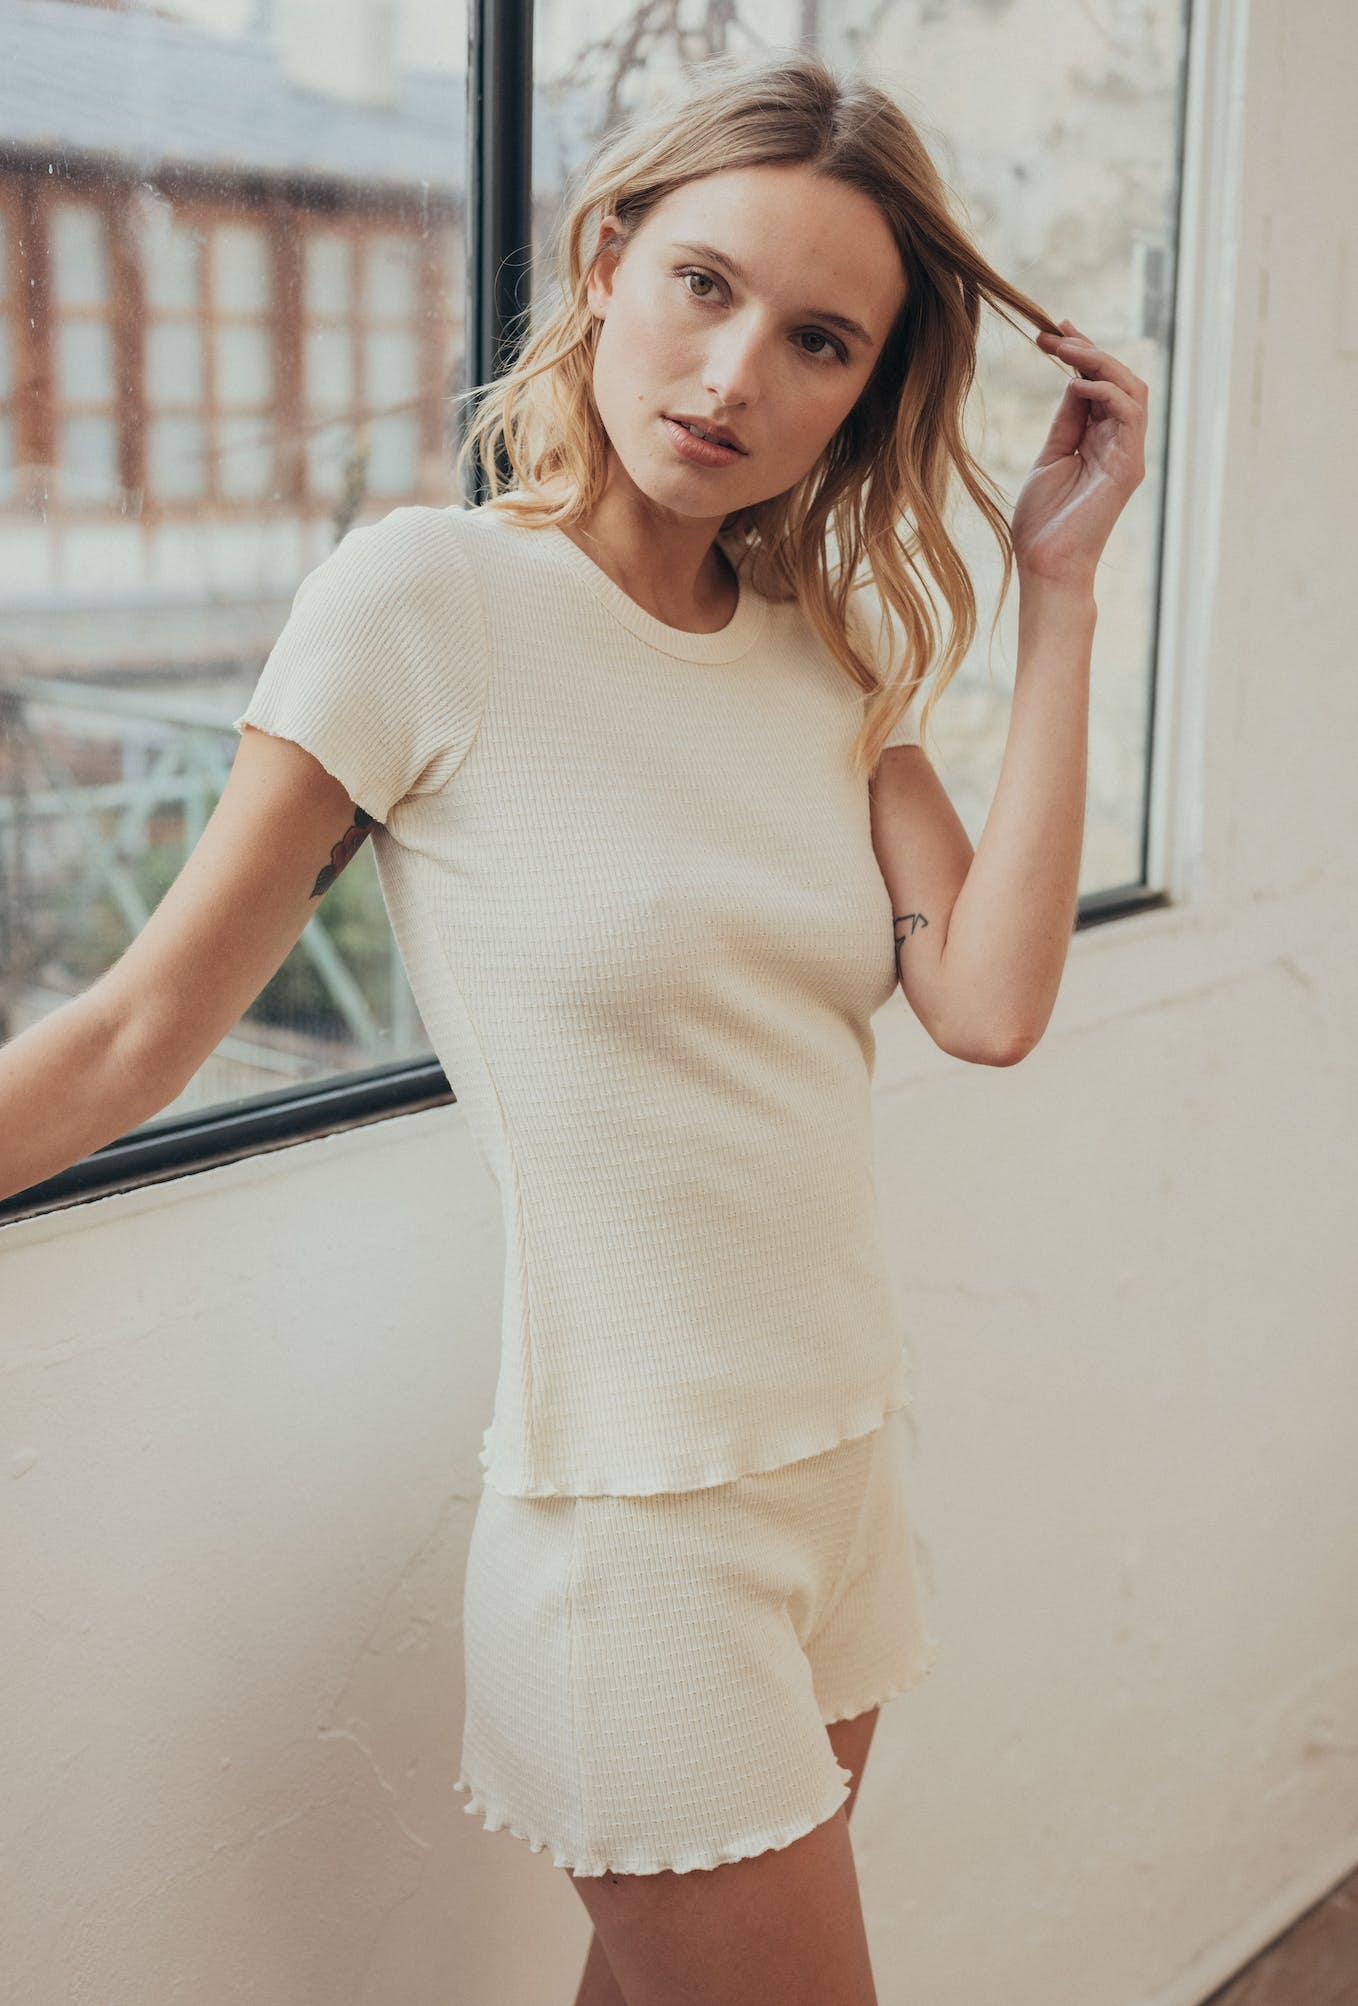 Vanilla homewear set with tee-shirt and shorts